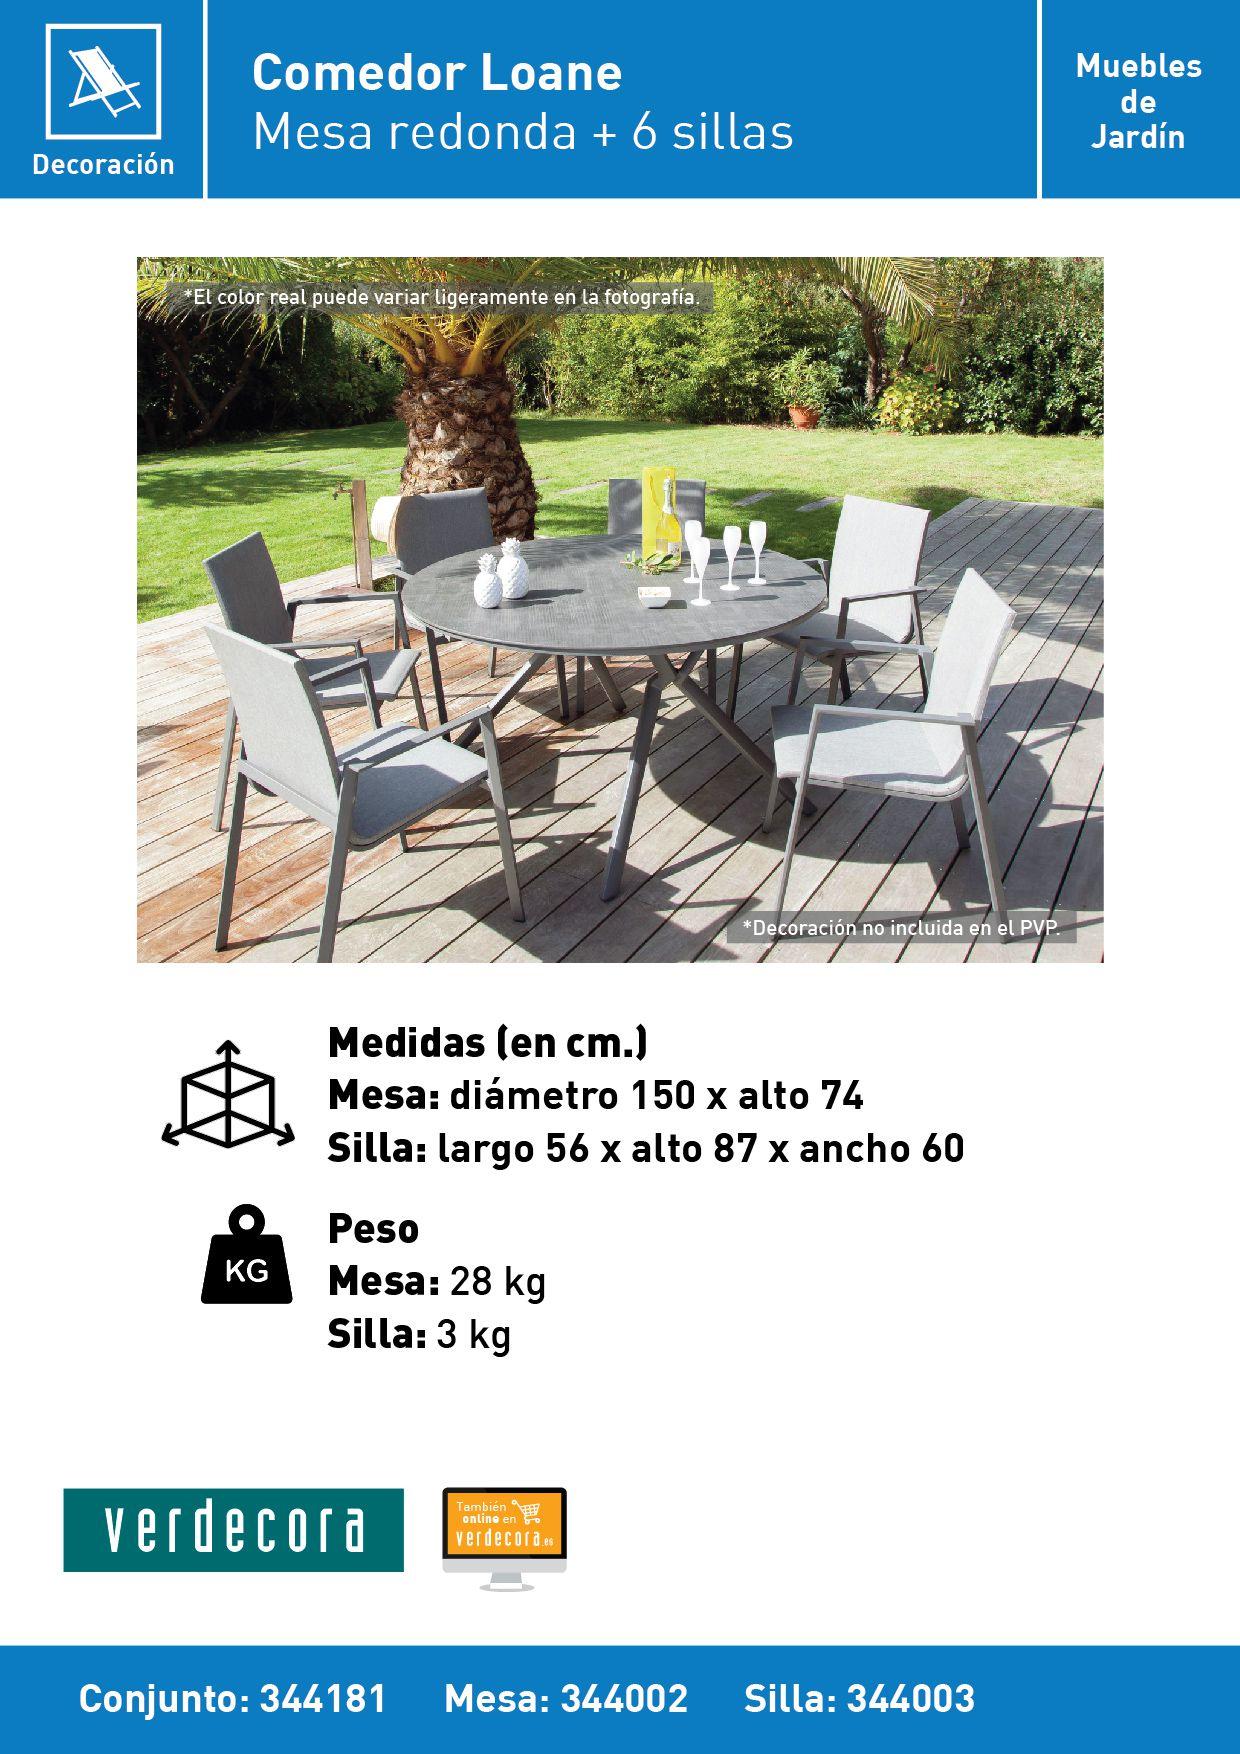 Conjunto Comedor De Jardin Loane Verdecora # Muebles Riego De La Vega